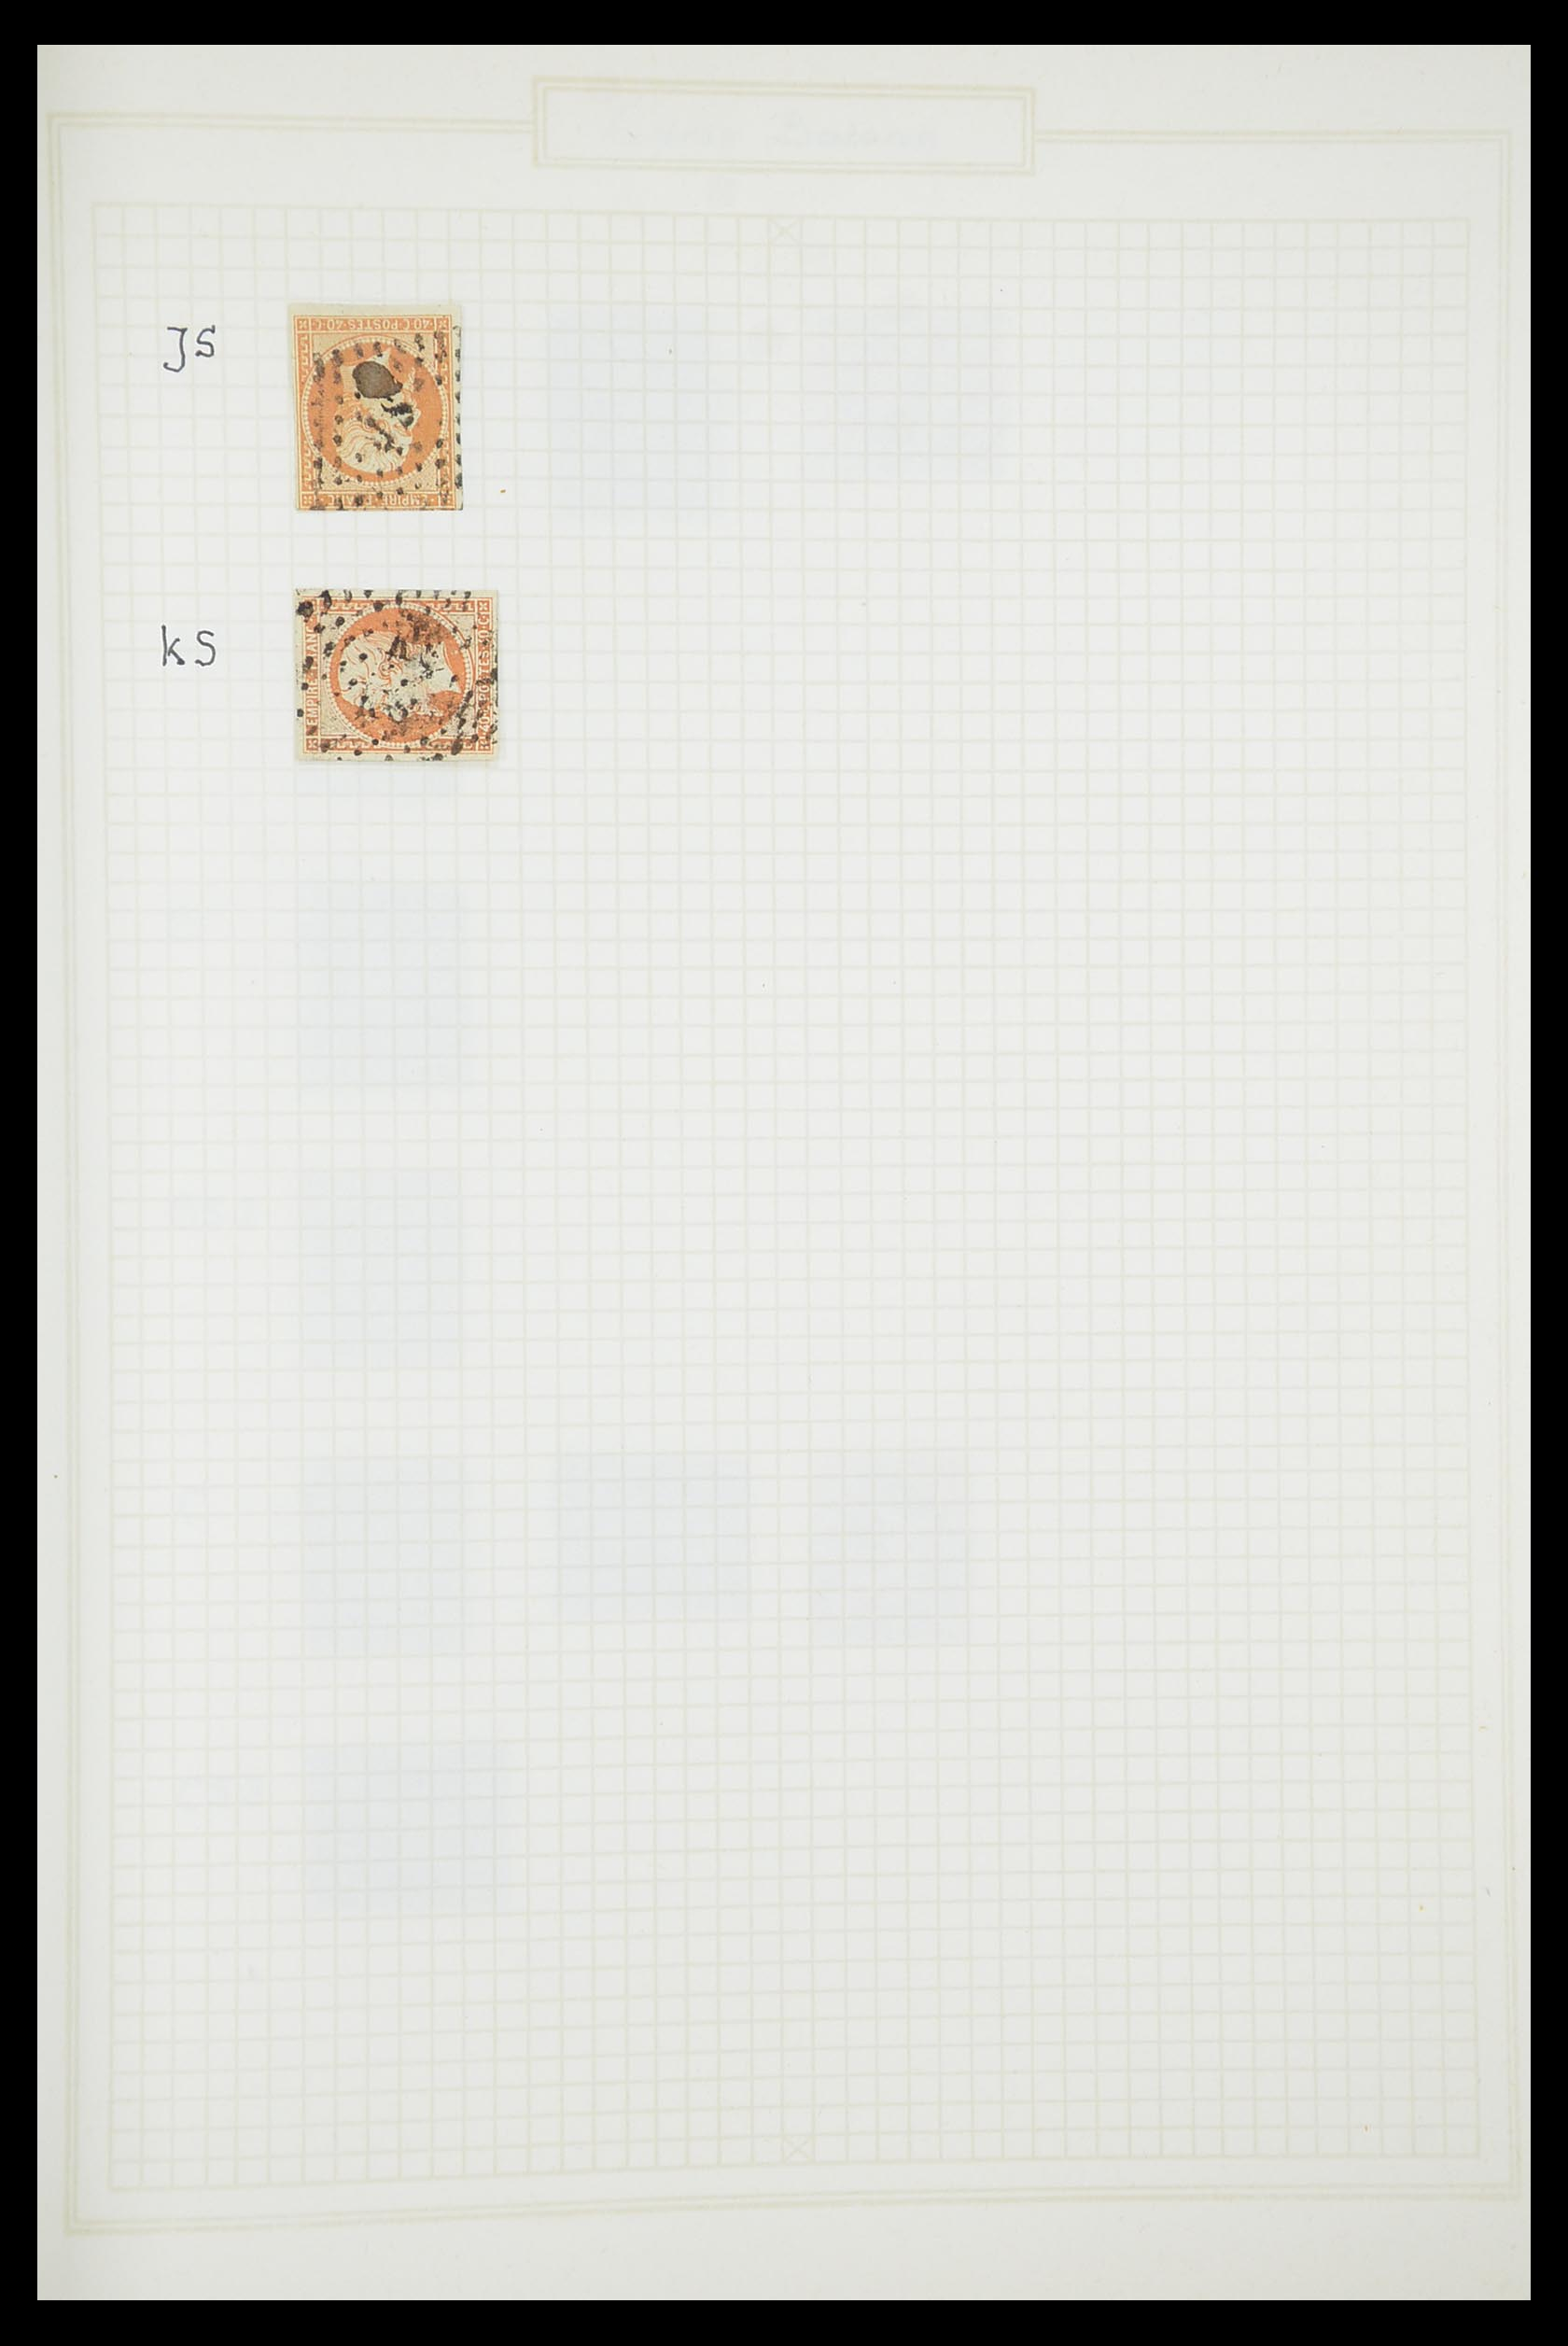 33851 016 - Postzegelverzameling 33851 Frankrijk klassiek stempels.